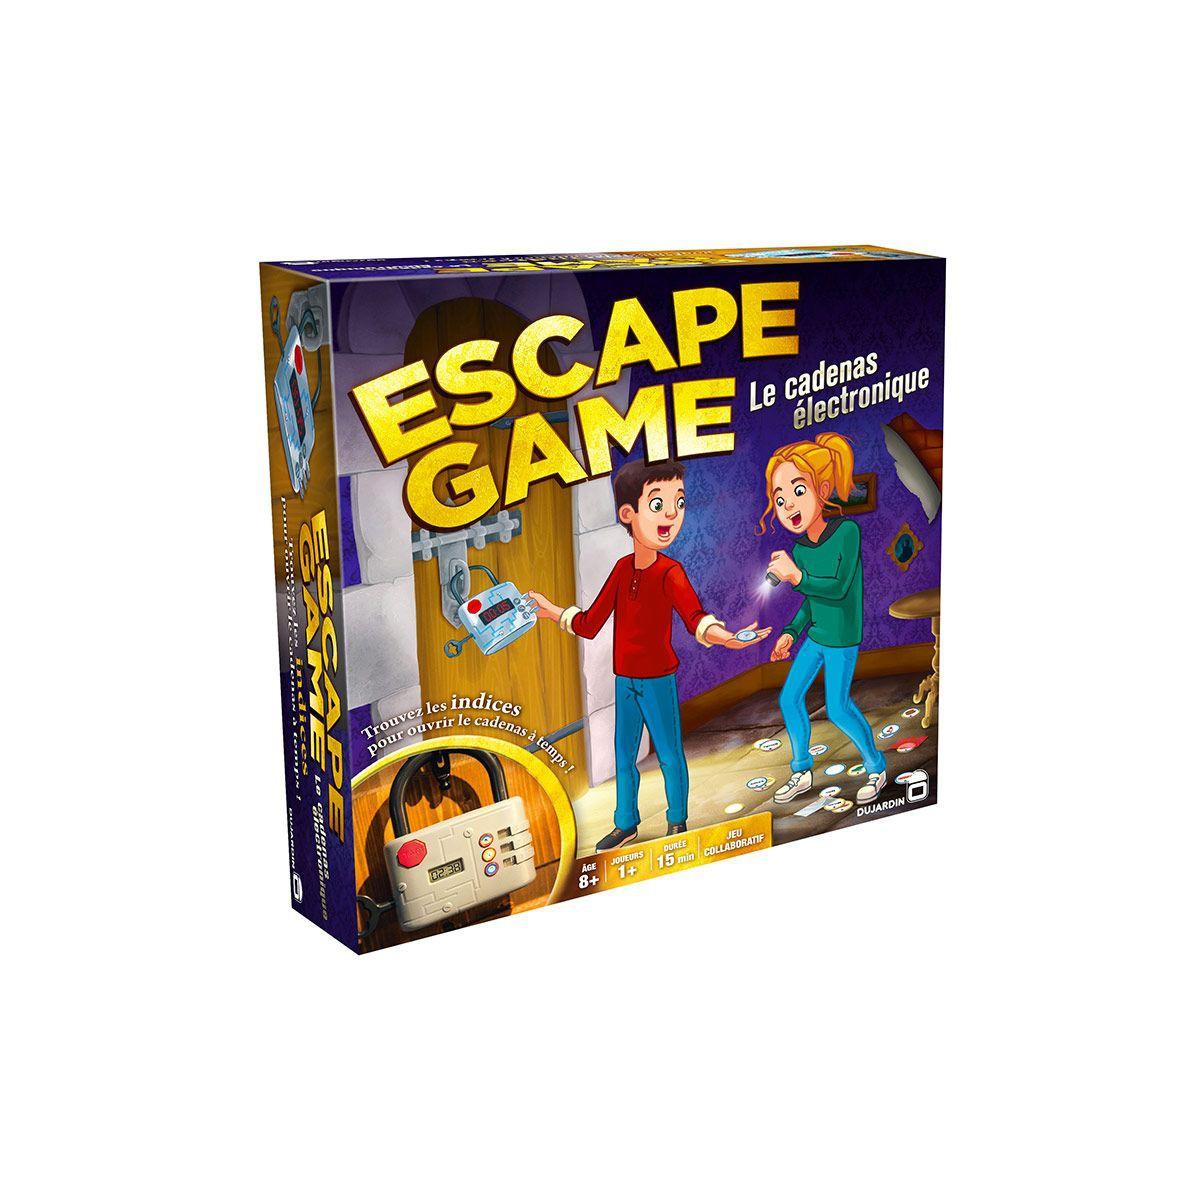 jeu de société escape game dujardin